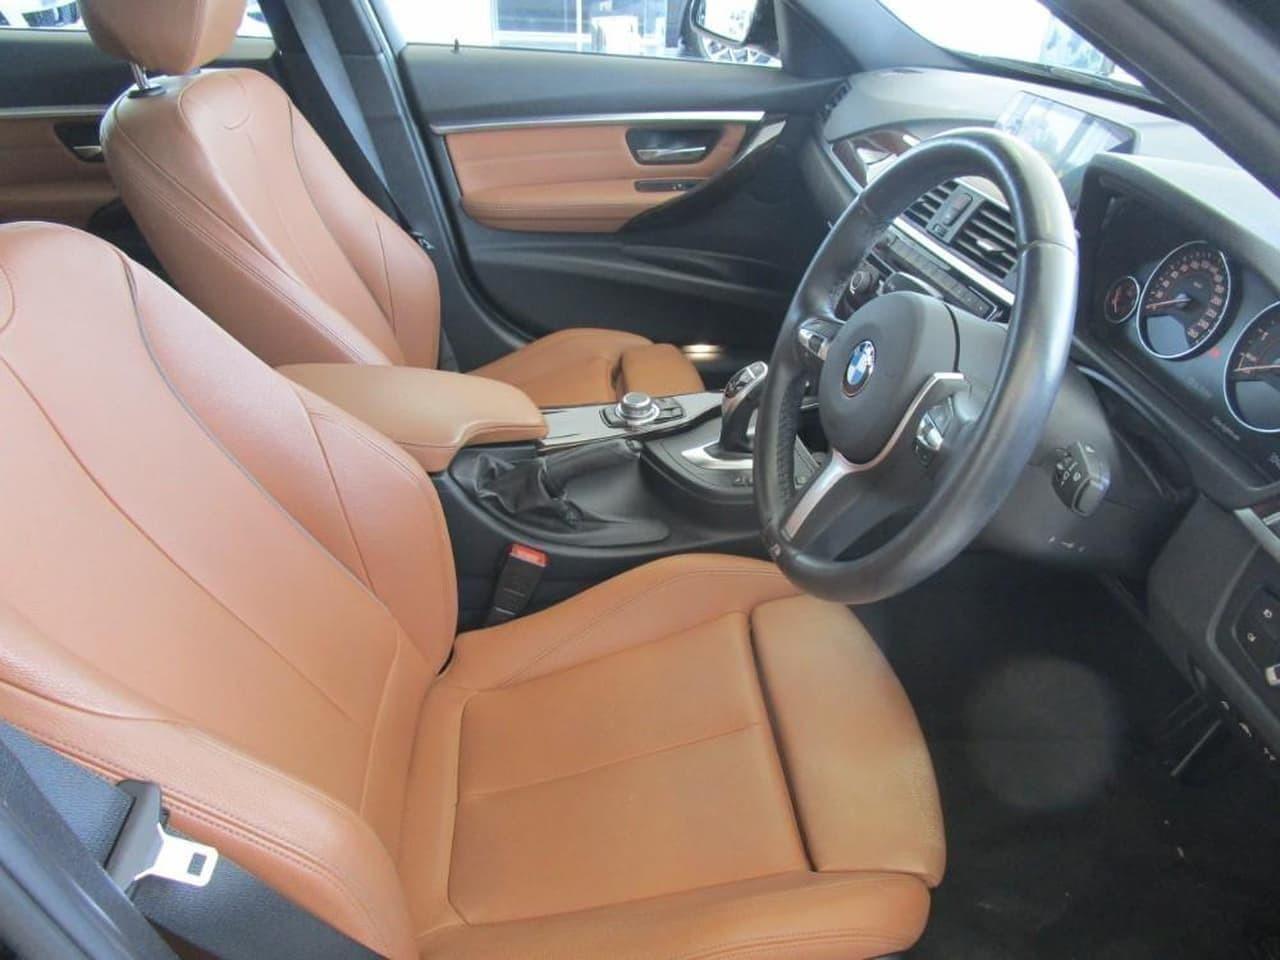 2015 BMW 3 Series Model No. 3 320I Sedan